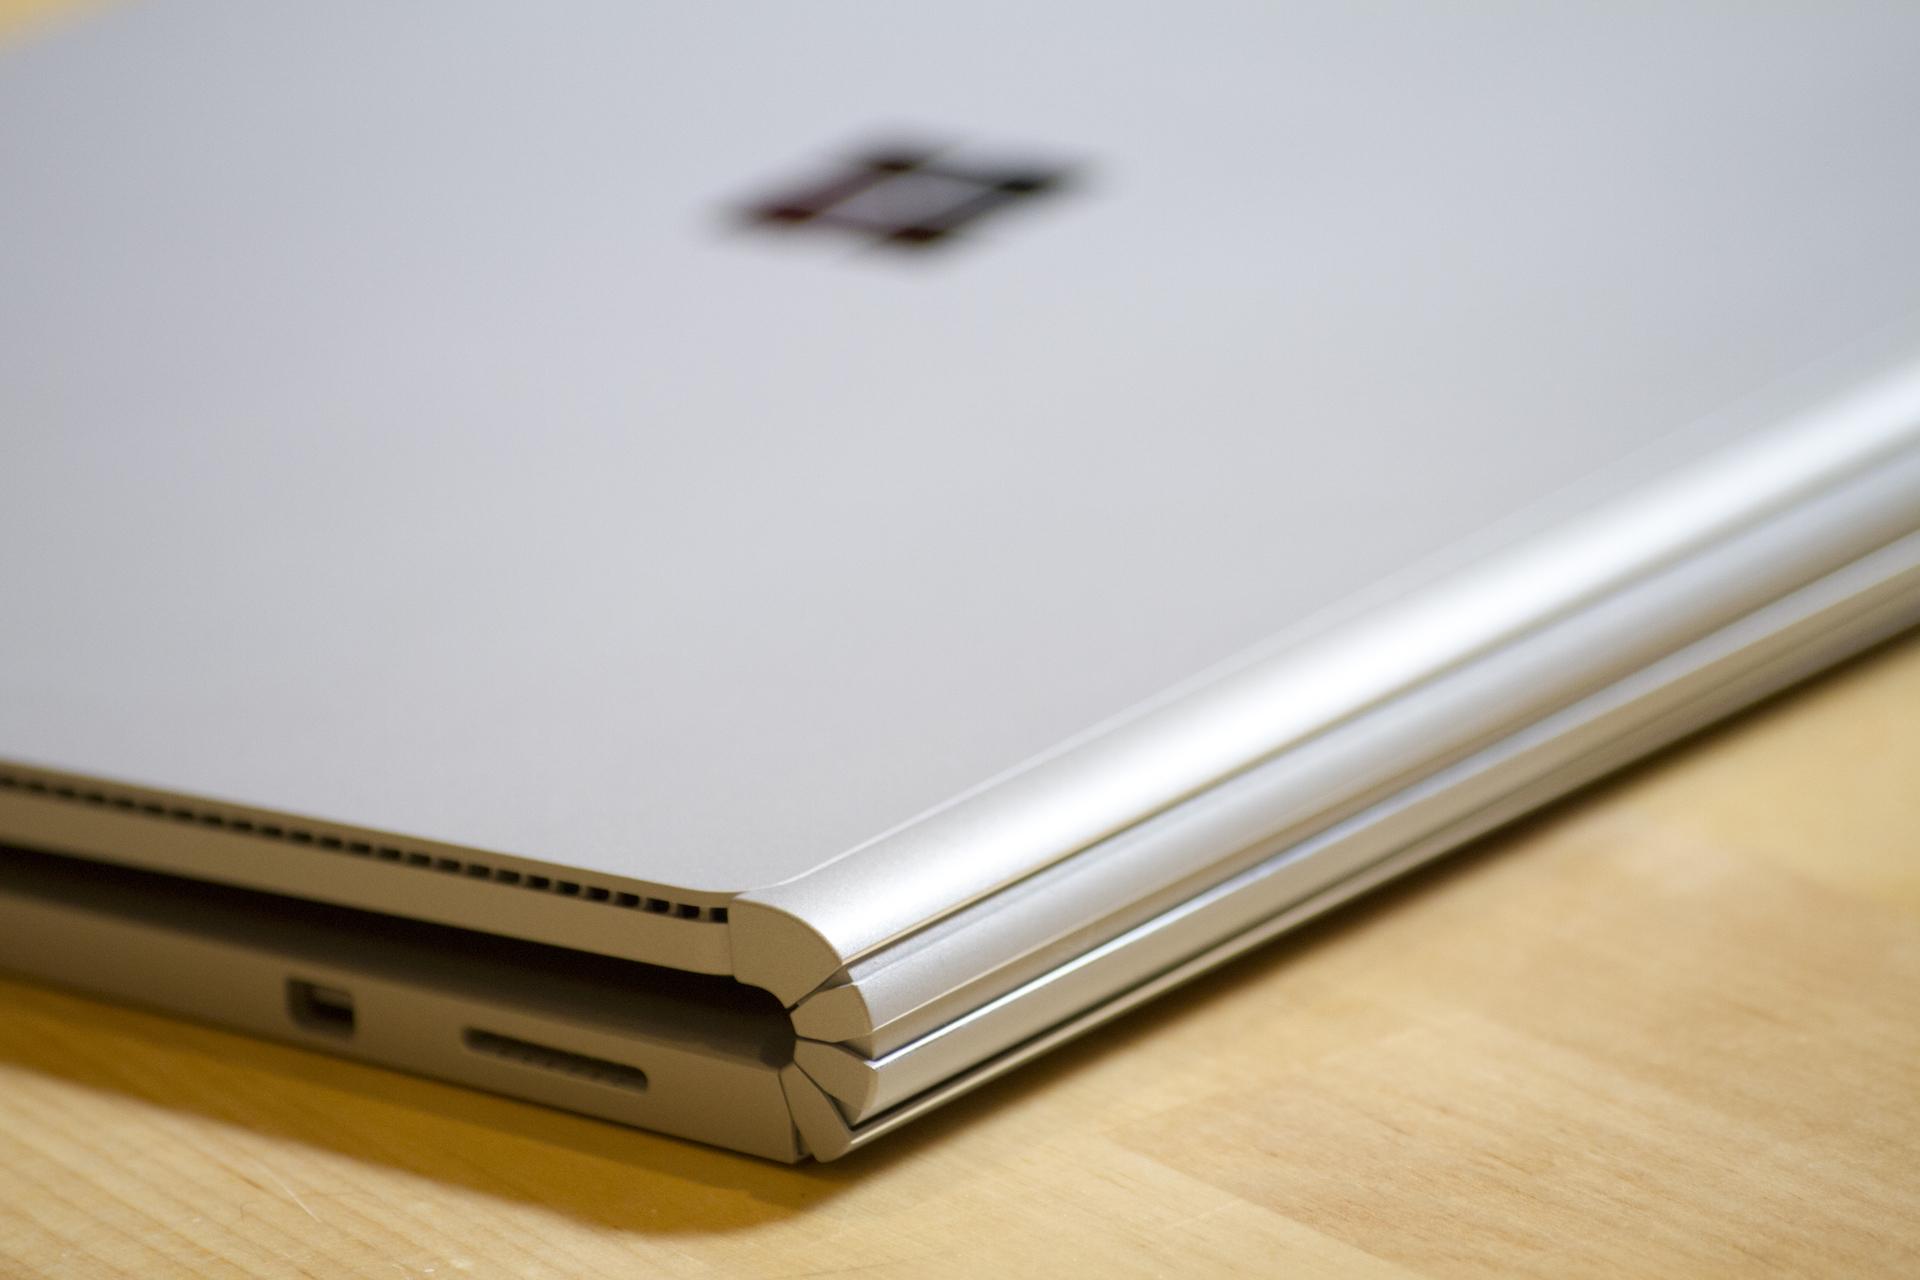 The Surface Book has a novel hinge.